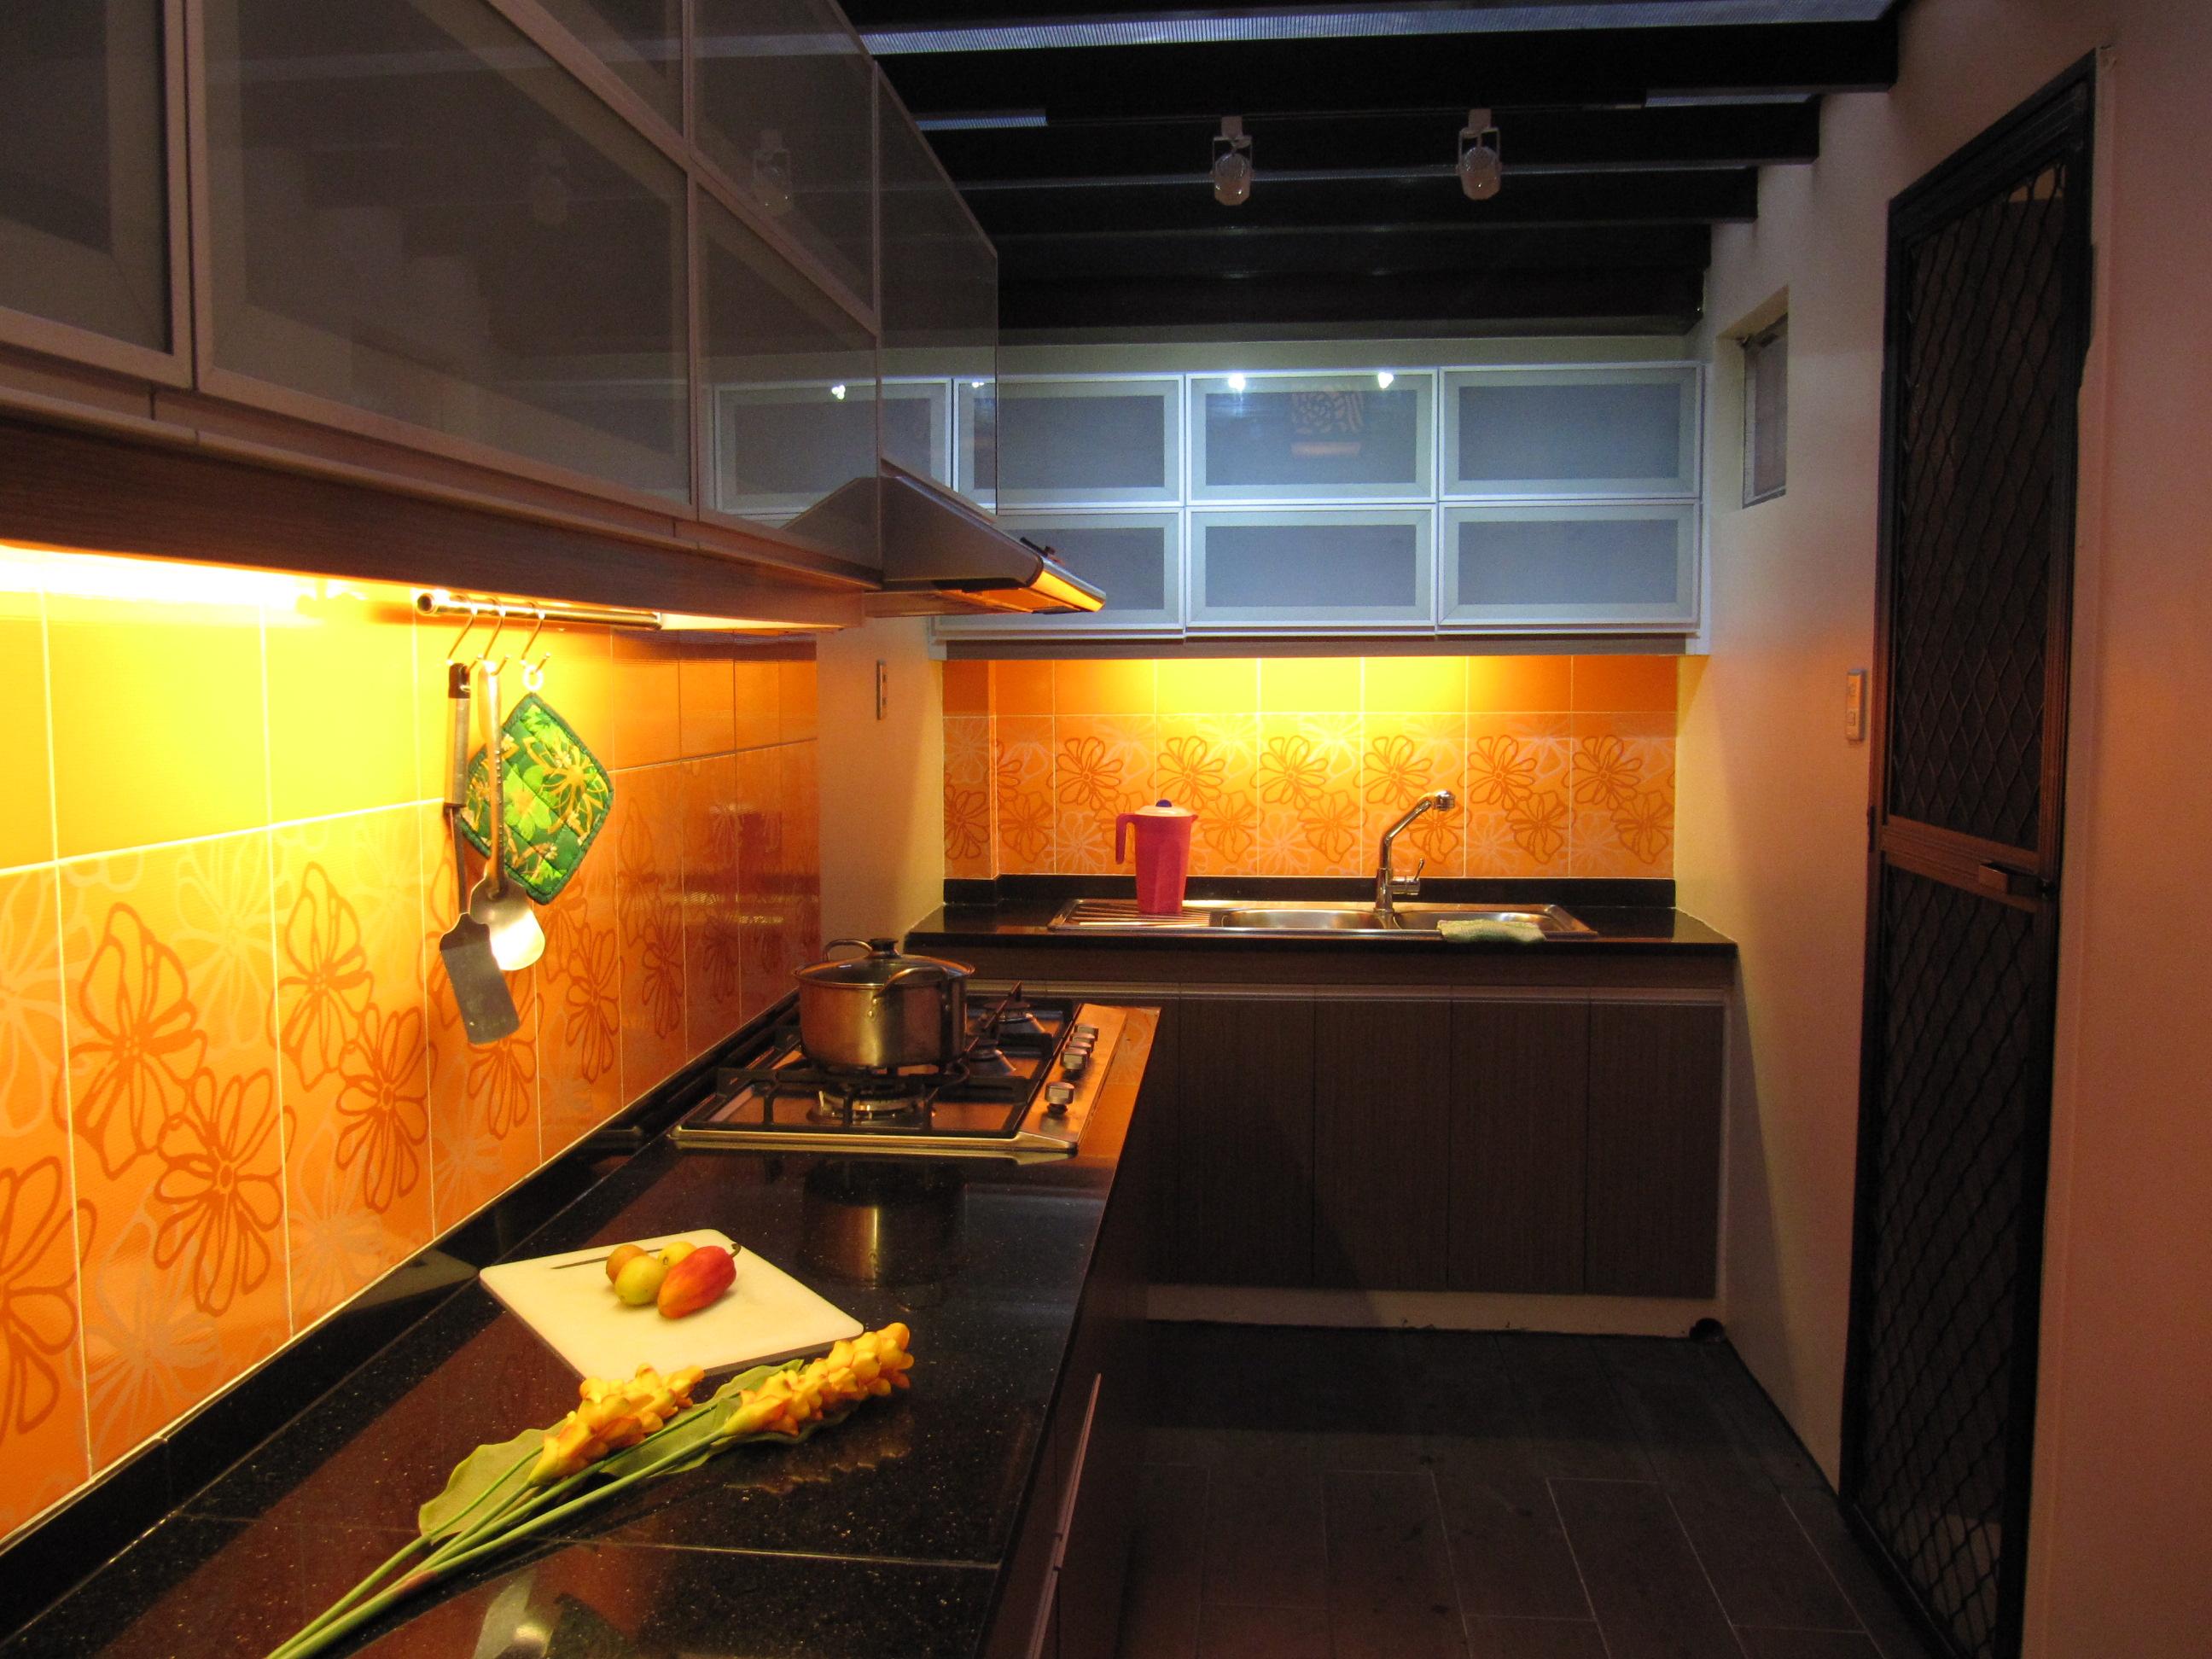 Kitchen design somerset place pasig city by anne margaret ayet san jose aniag design1528 at Kitchen design center san jose